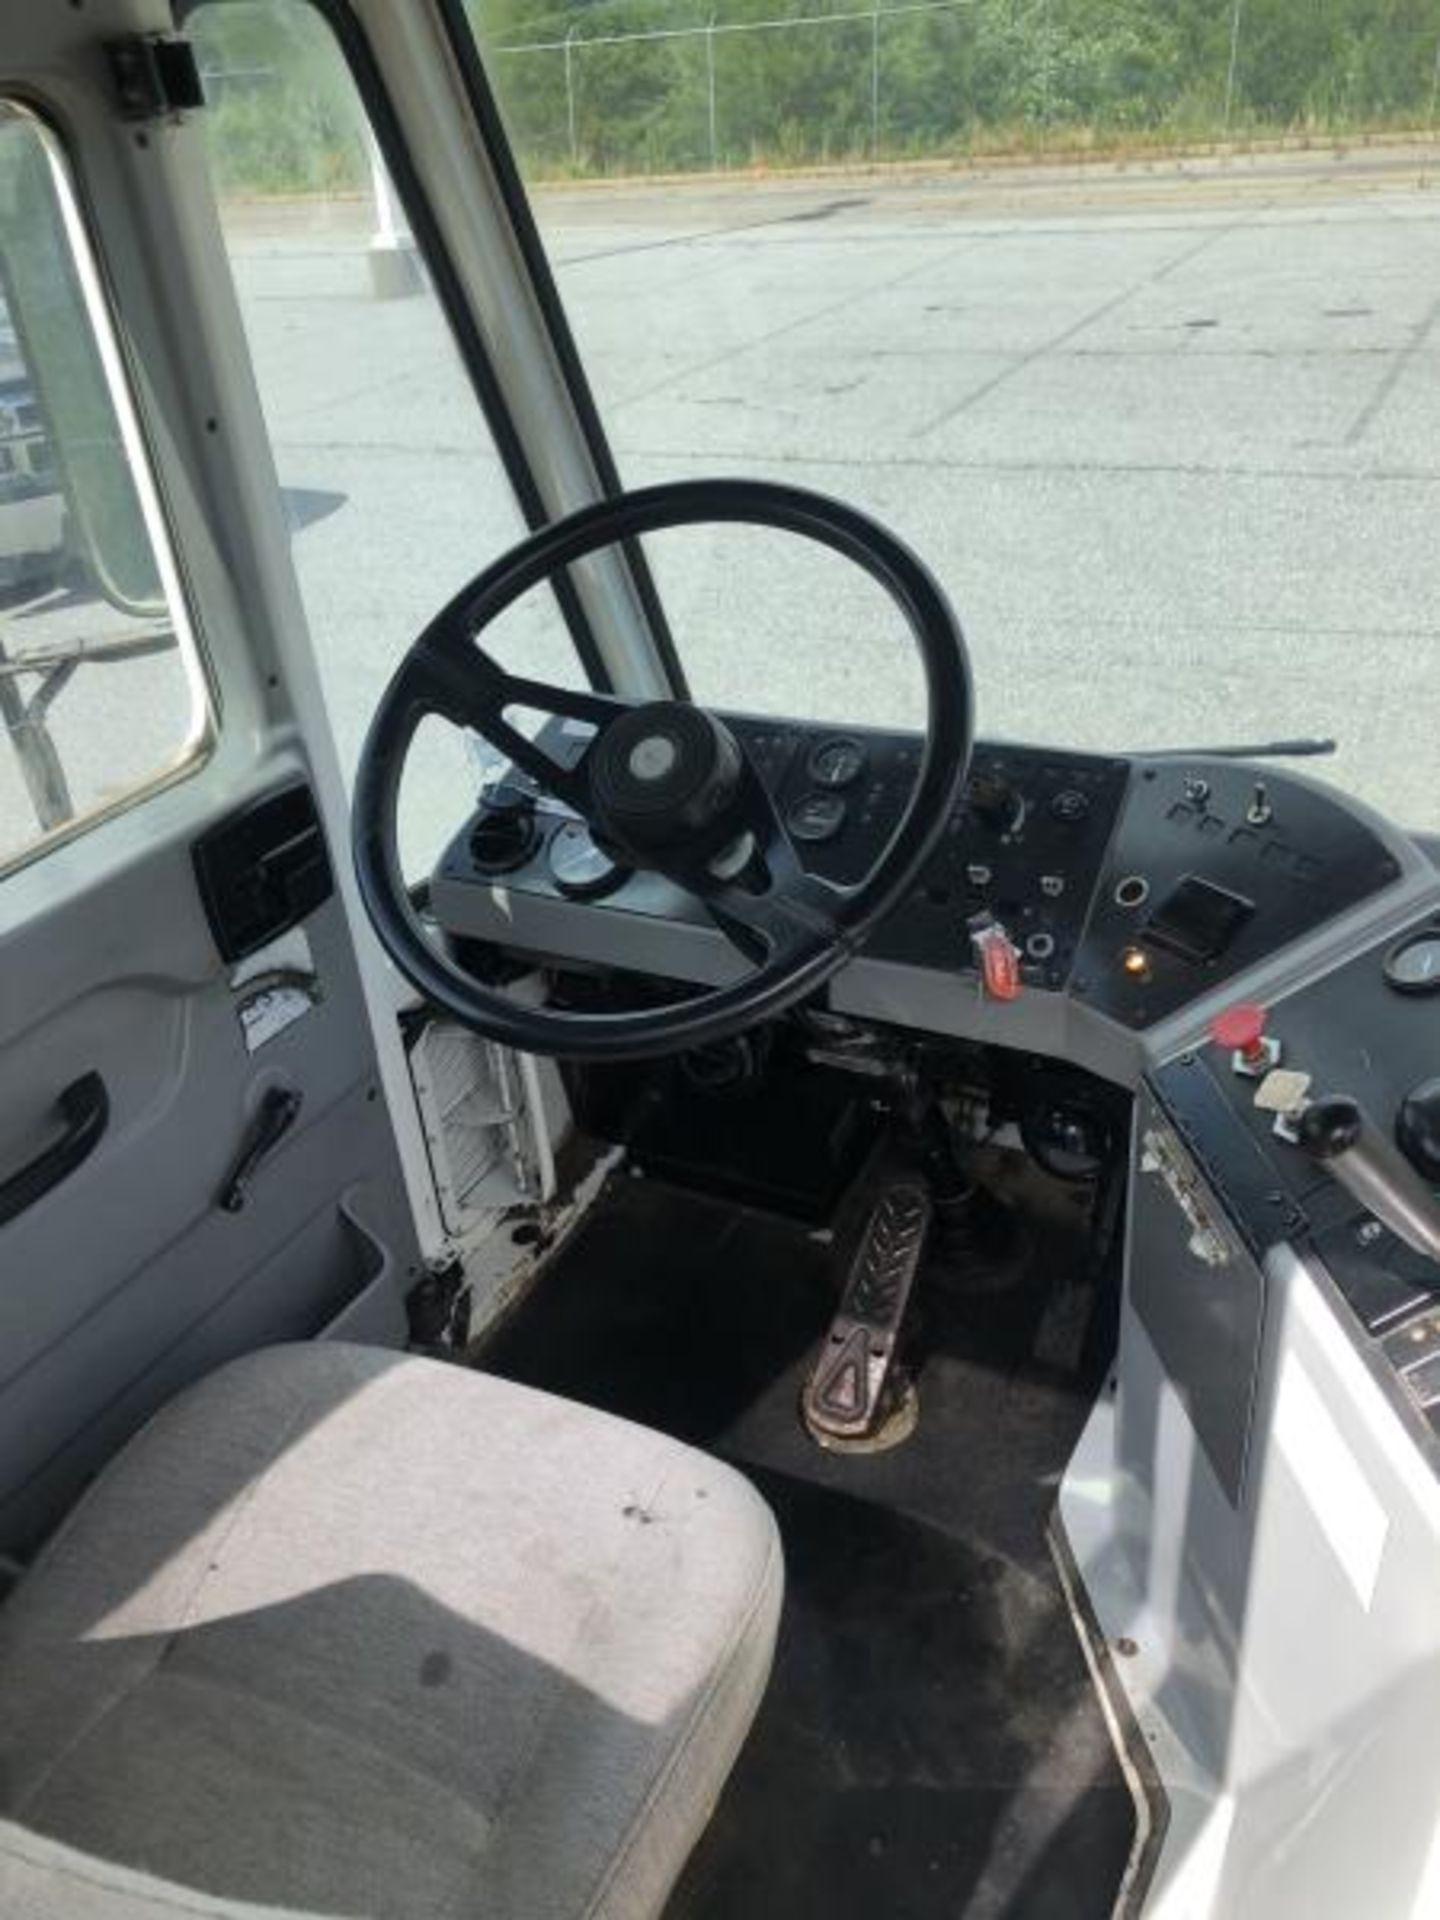 2015 Kalmar Ottawa 4x2 Yard Truck , SN: 338838 3,710.3 Hours, 2,817 Miles - Image 9 of 28